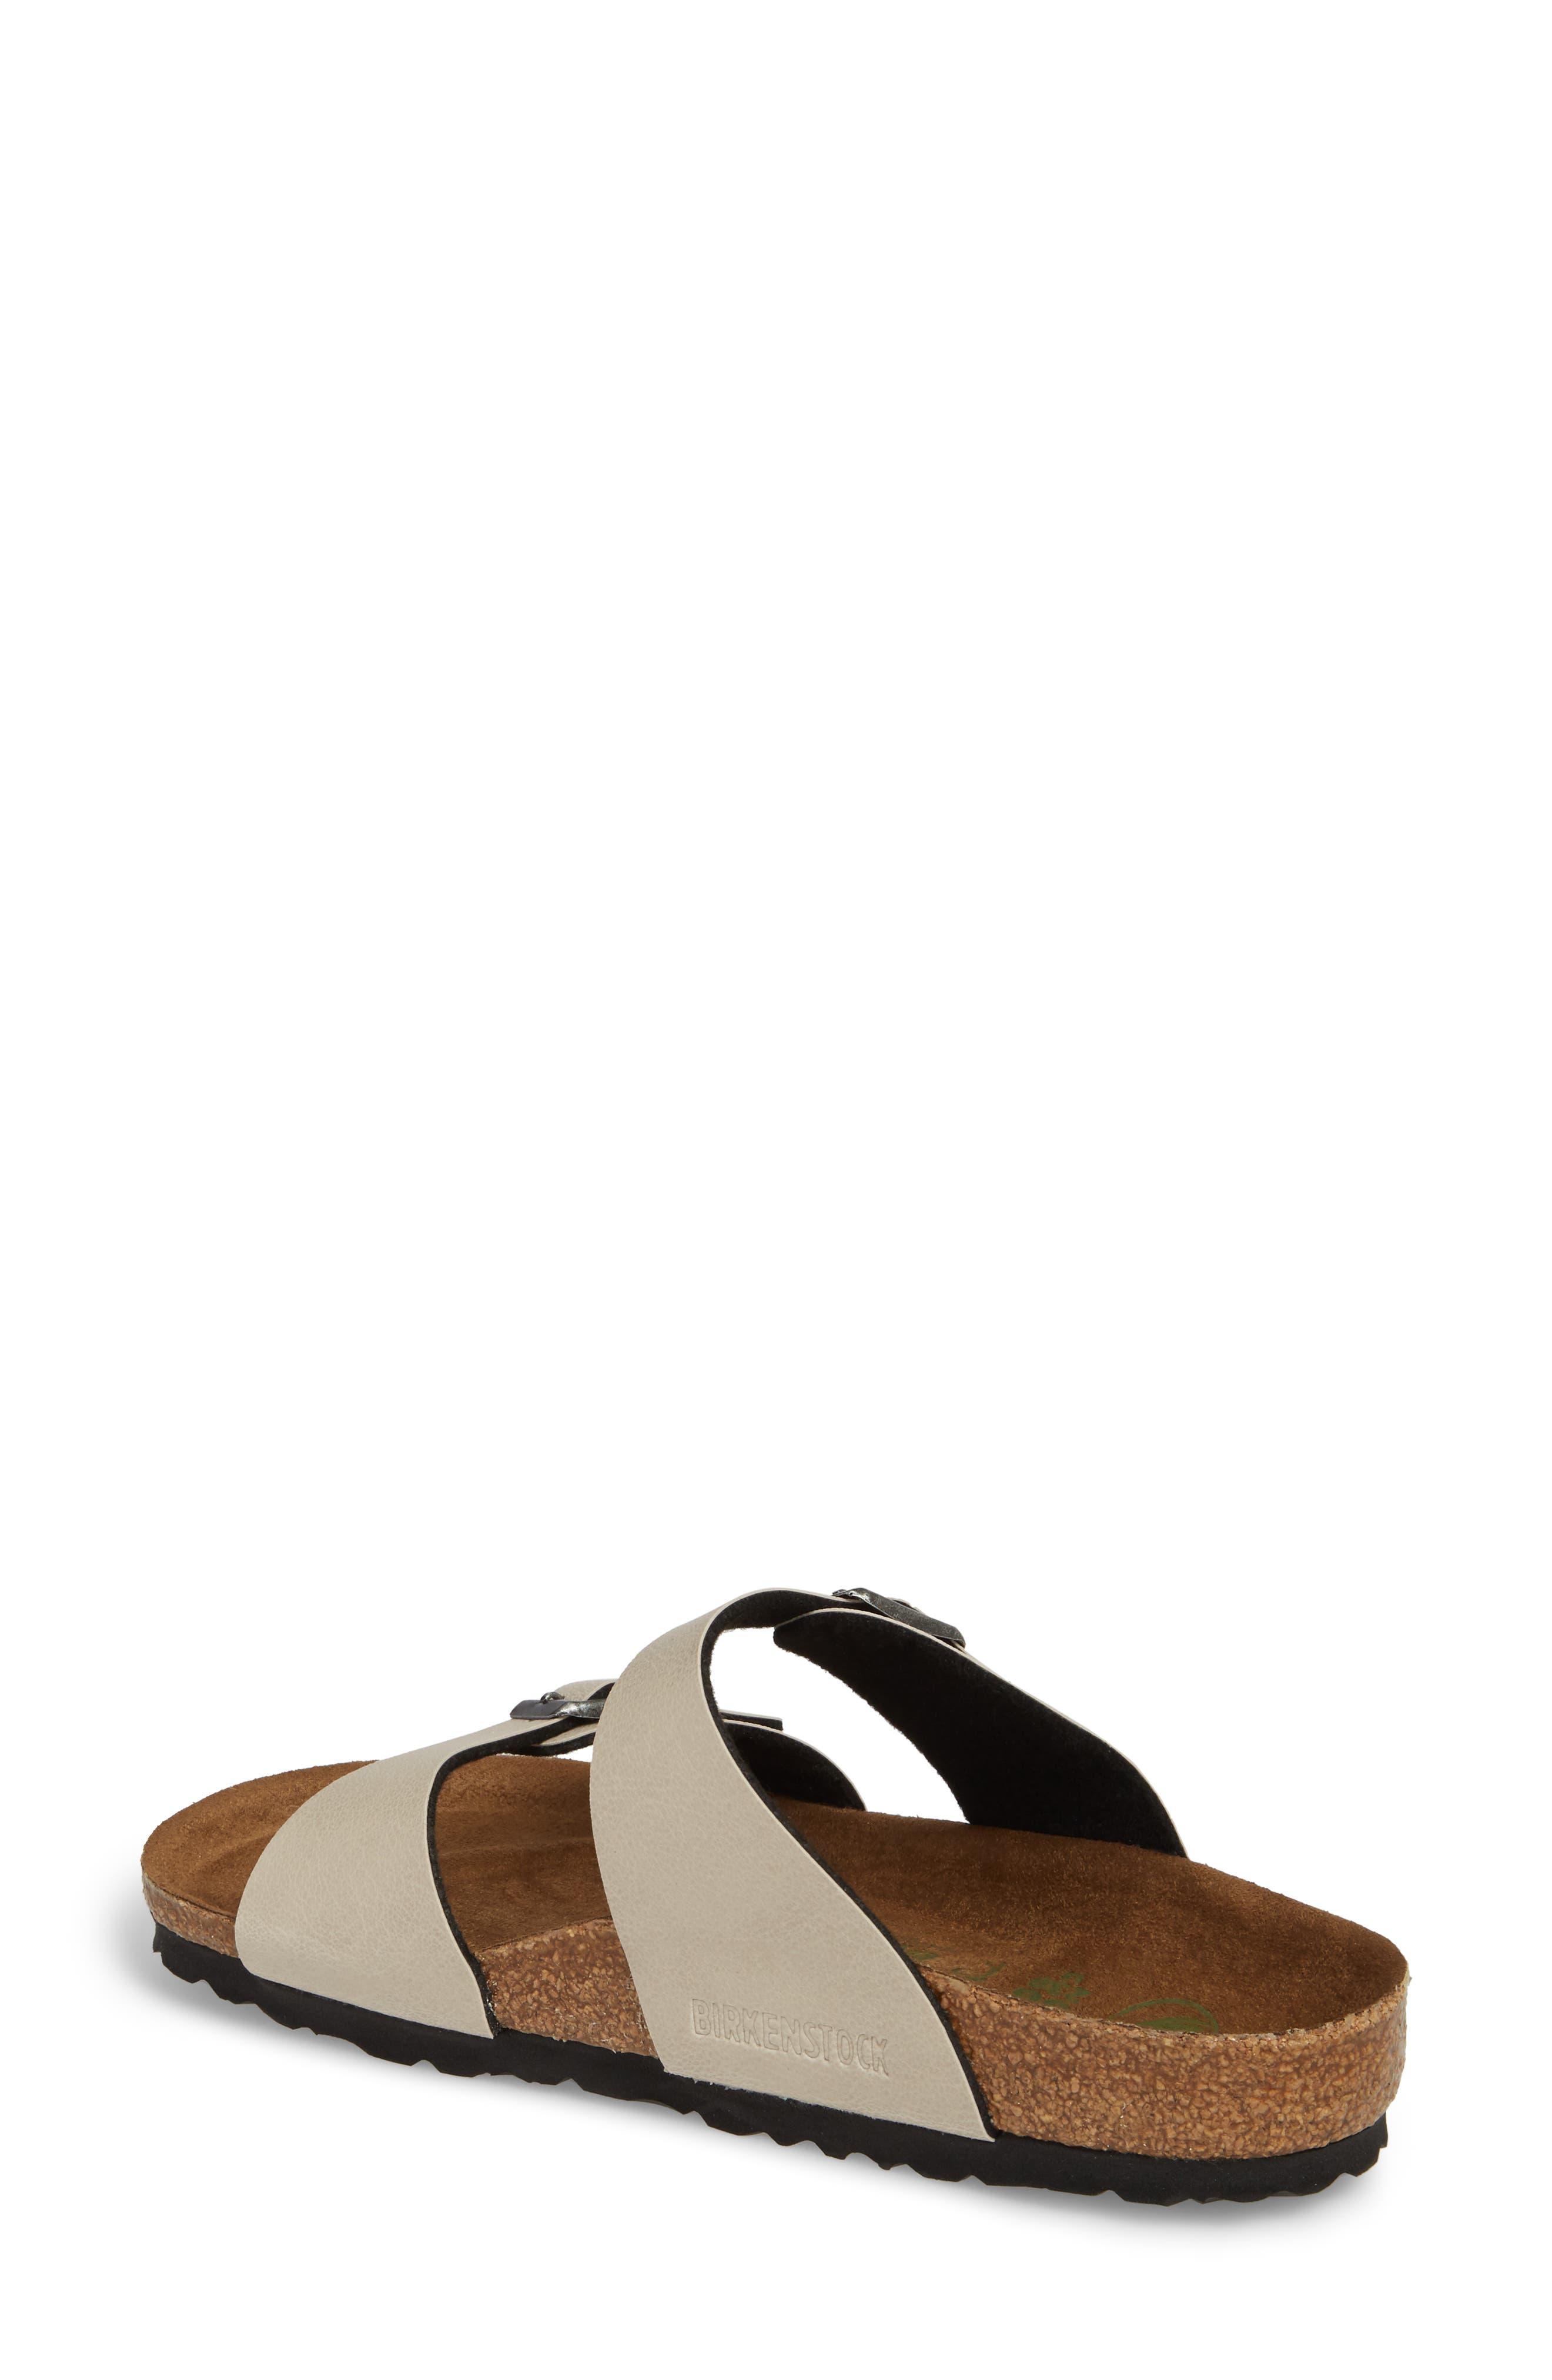 'Sydney' Sandal,                             Alternate thumbnail 2, color,                             Stone Leather